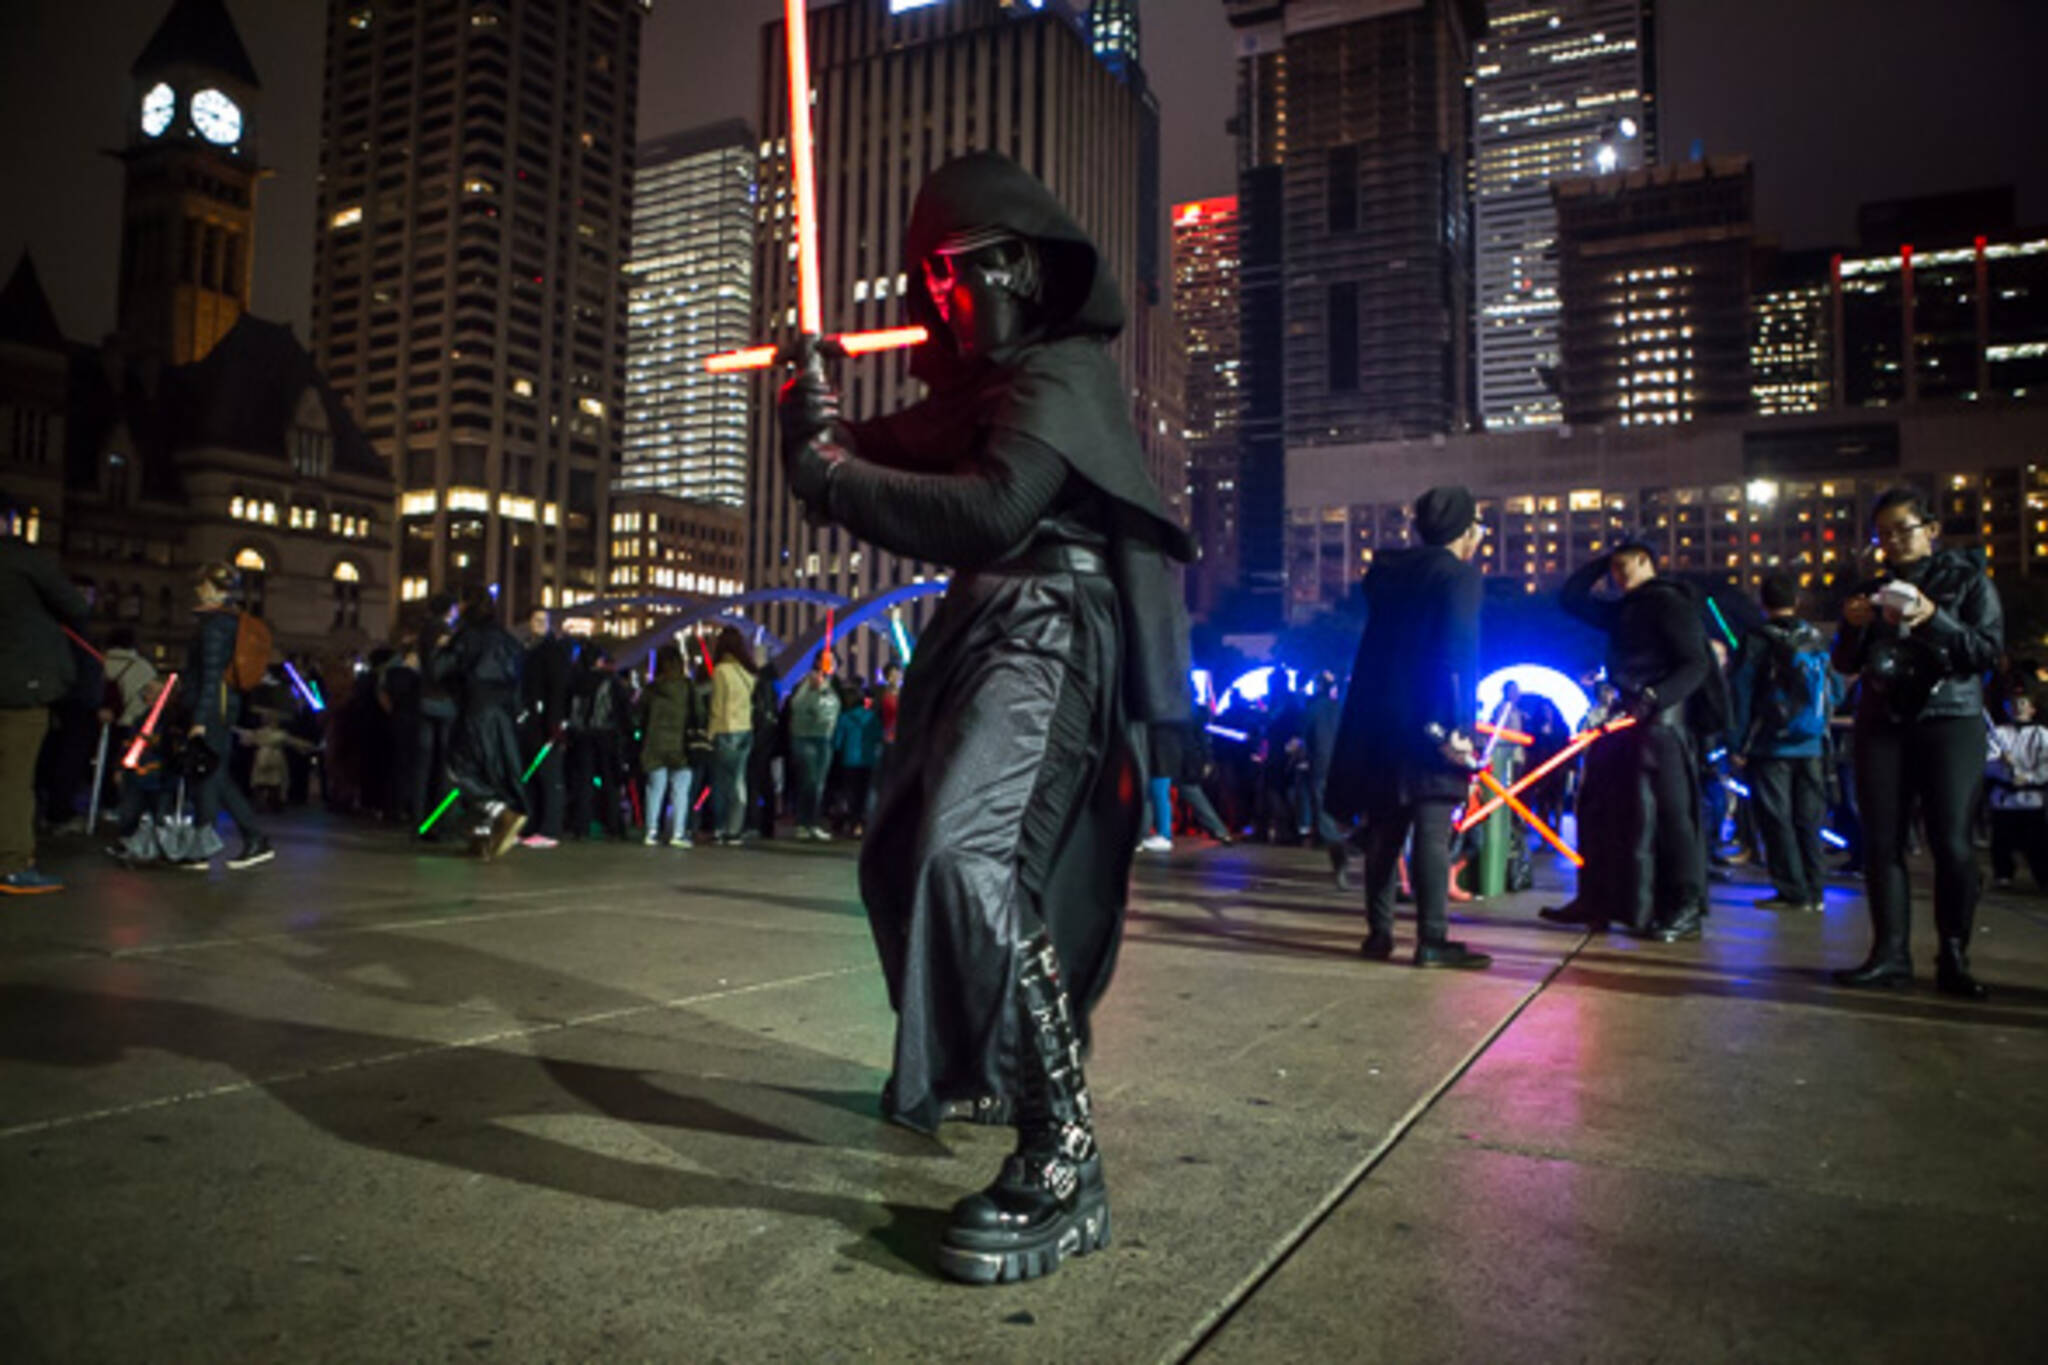 lightsaber battle toronto